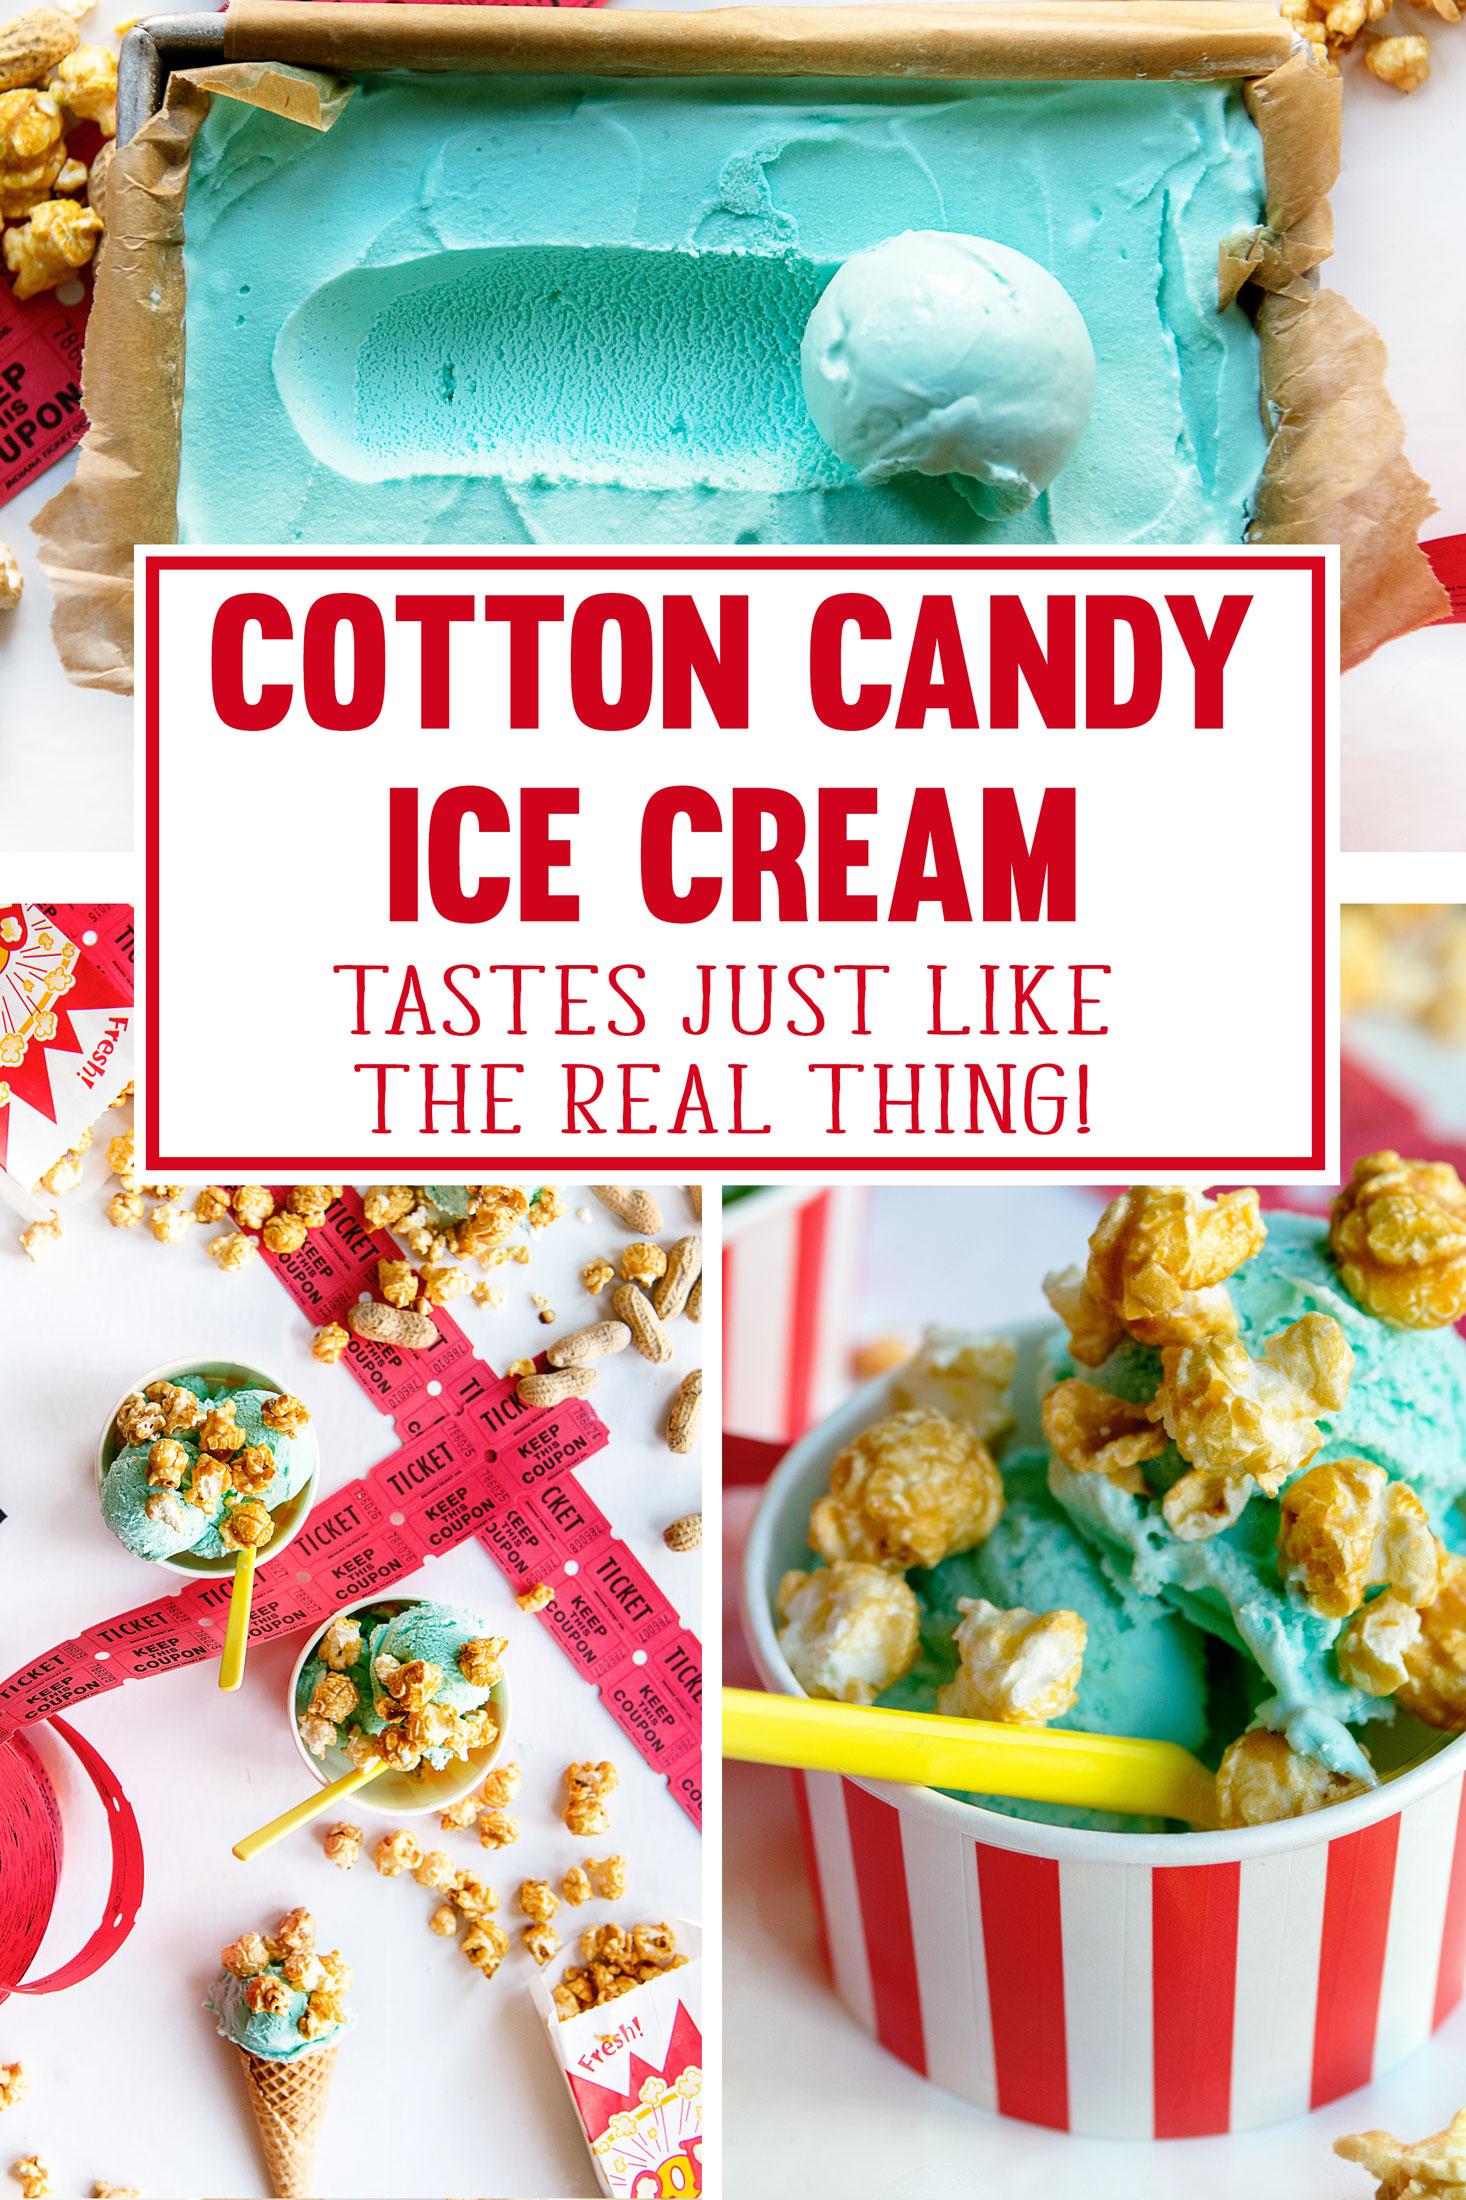 Circus Party Theme Ideas - Cotton Candy Ice Cream Recipe